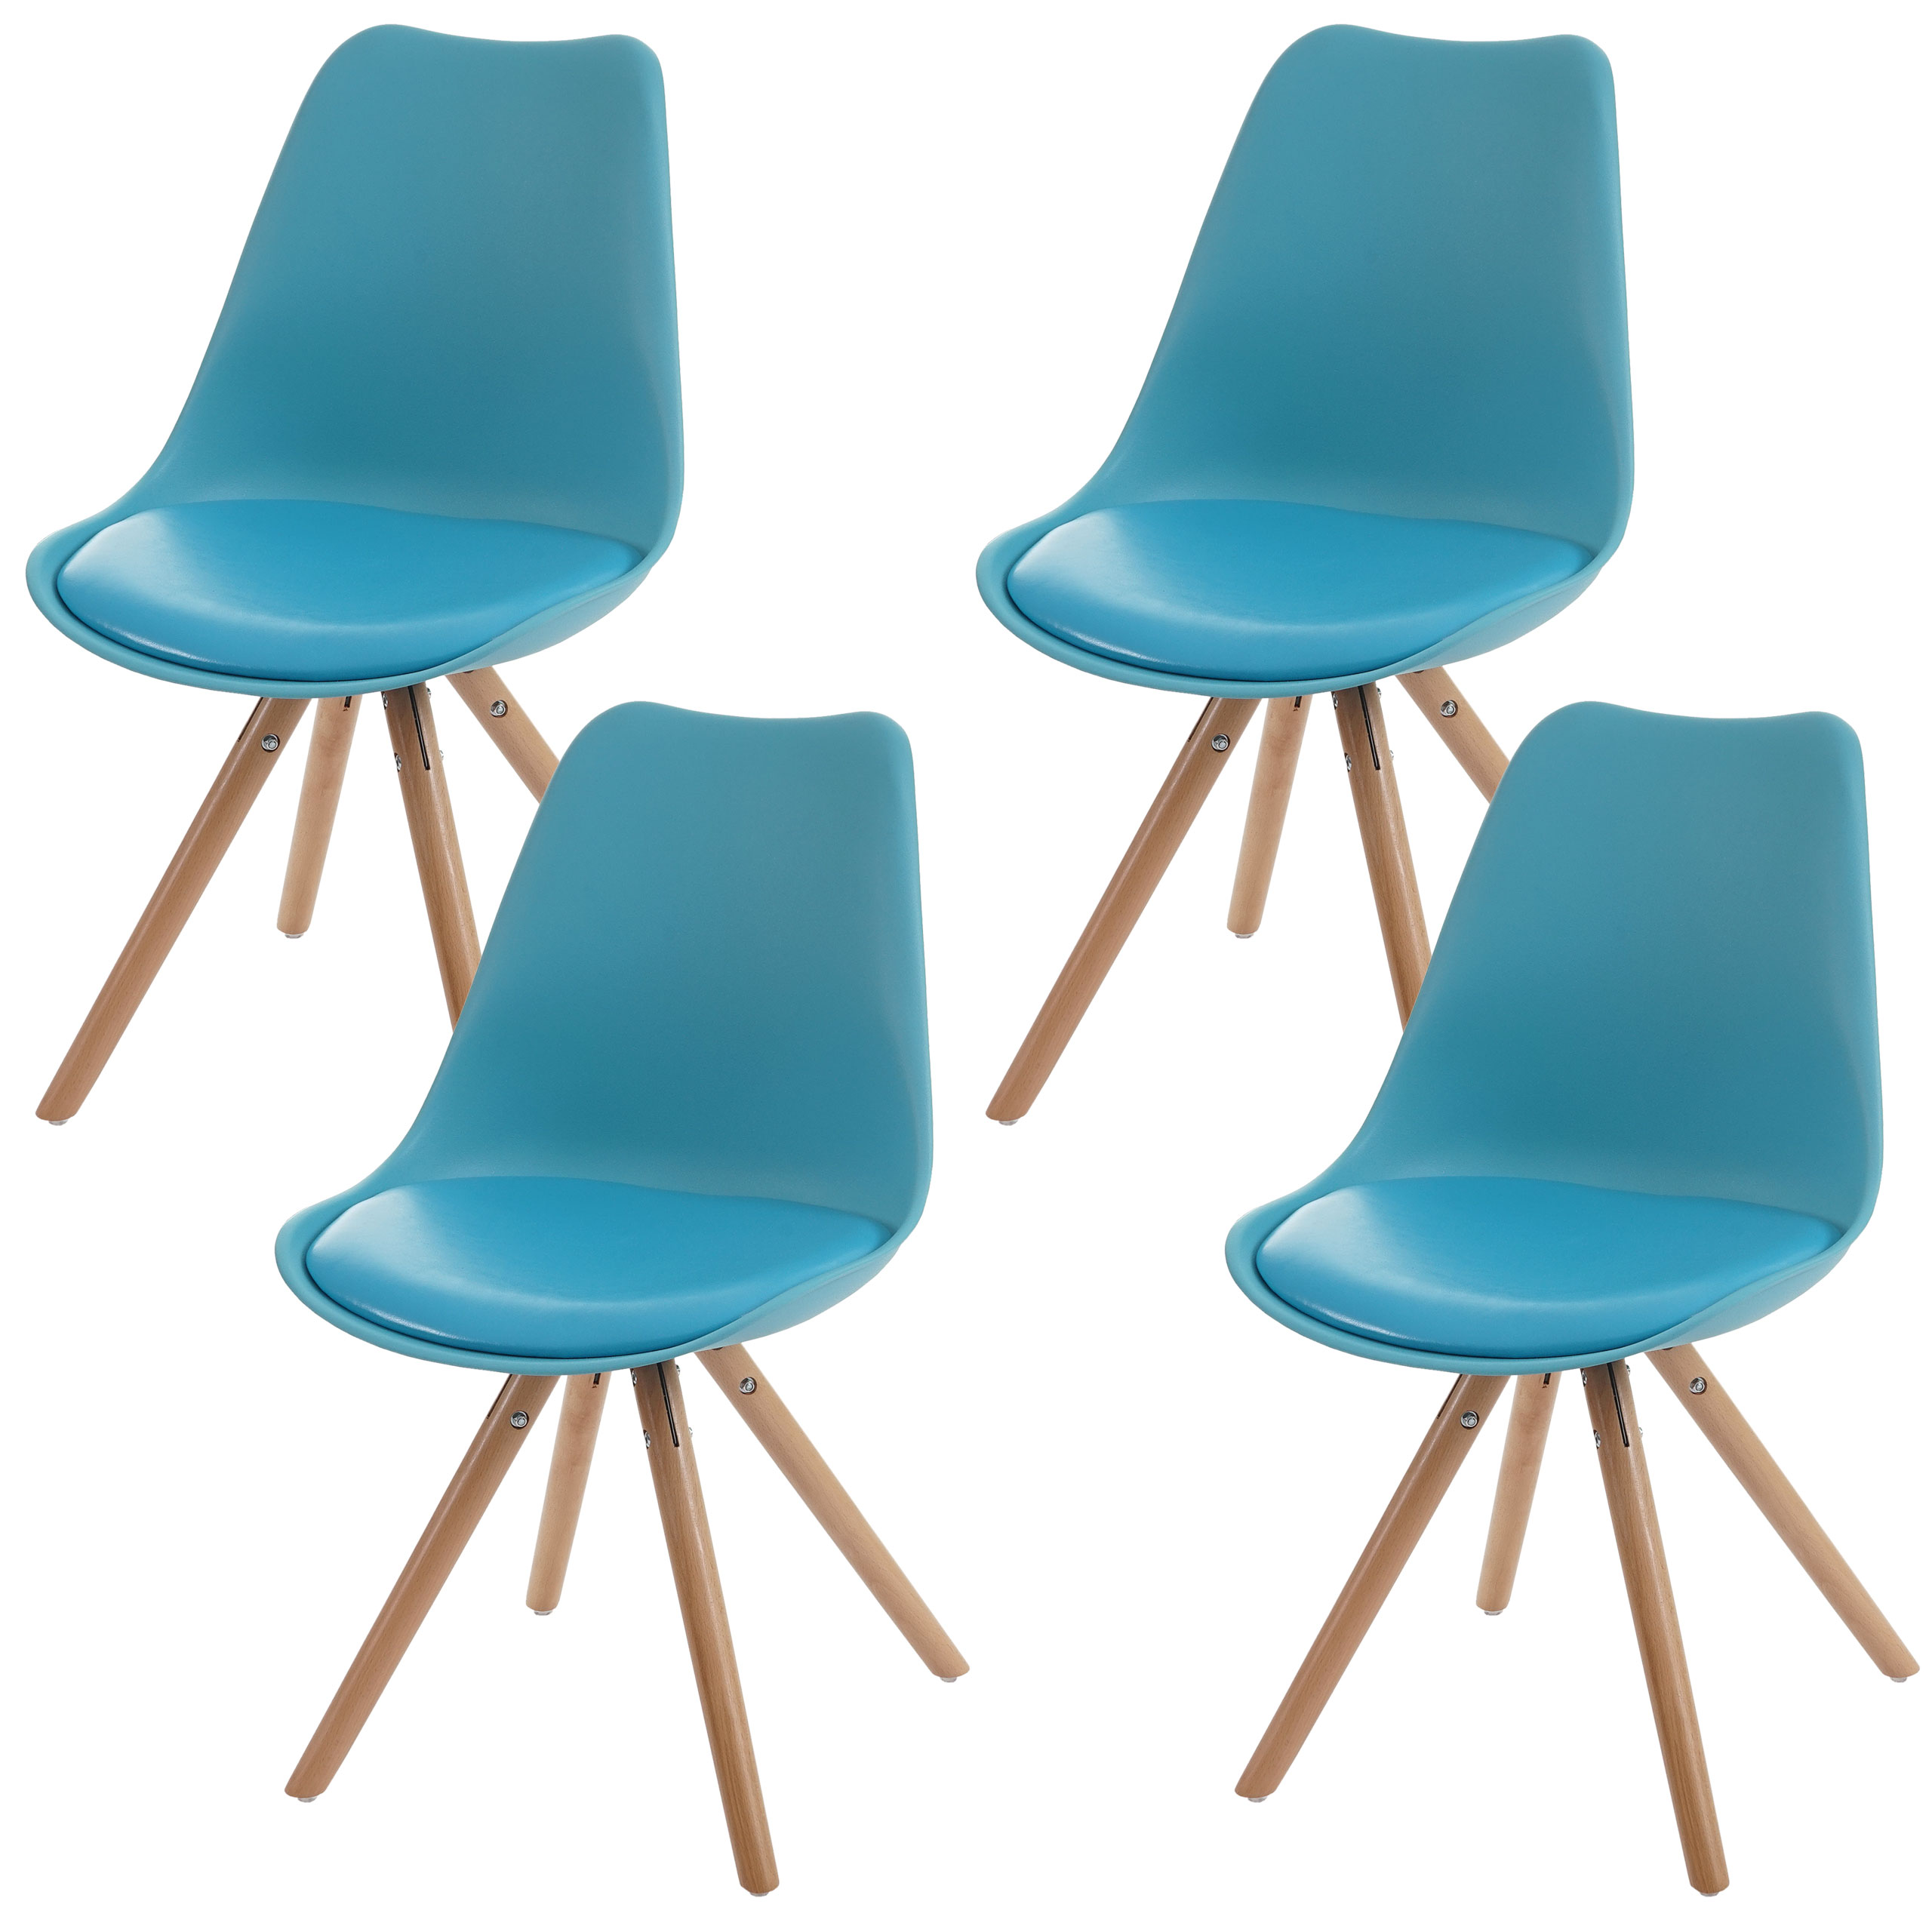 4x esszimmerstuhl malm t501 retro design t rkis. Black Bedroom Furniture Sets. Home Design Ideas